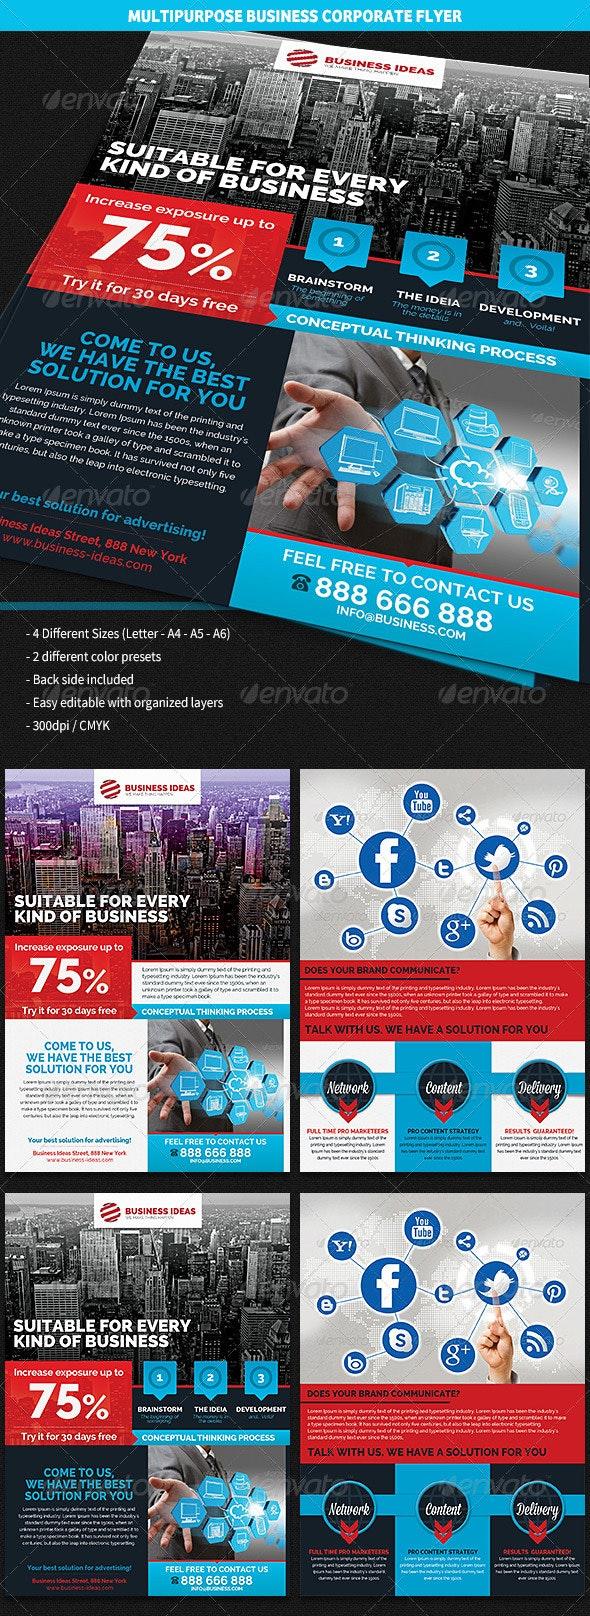 Multipurpose Corporate Business Flyer - Corporate Flyers